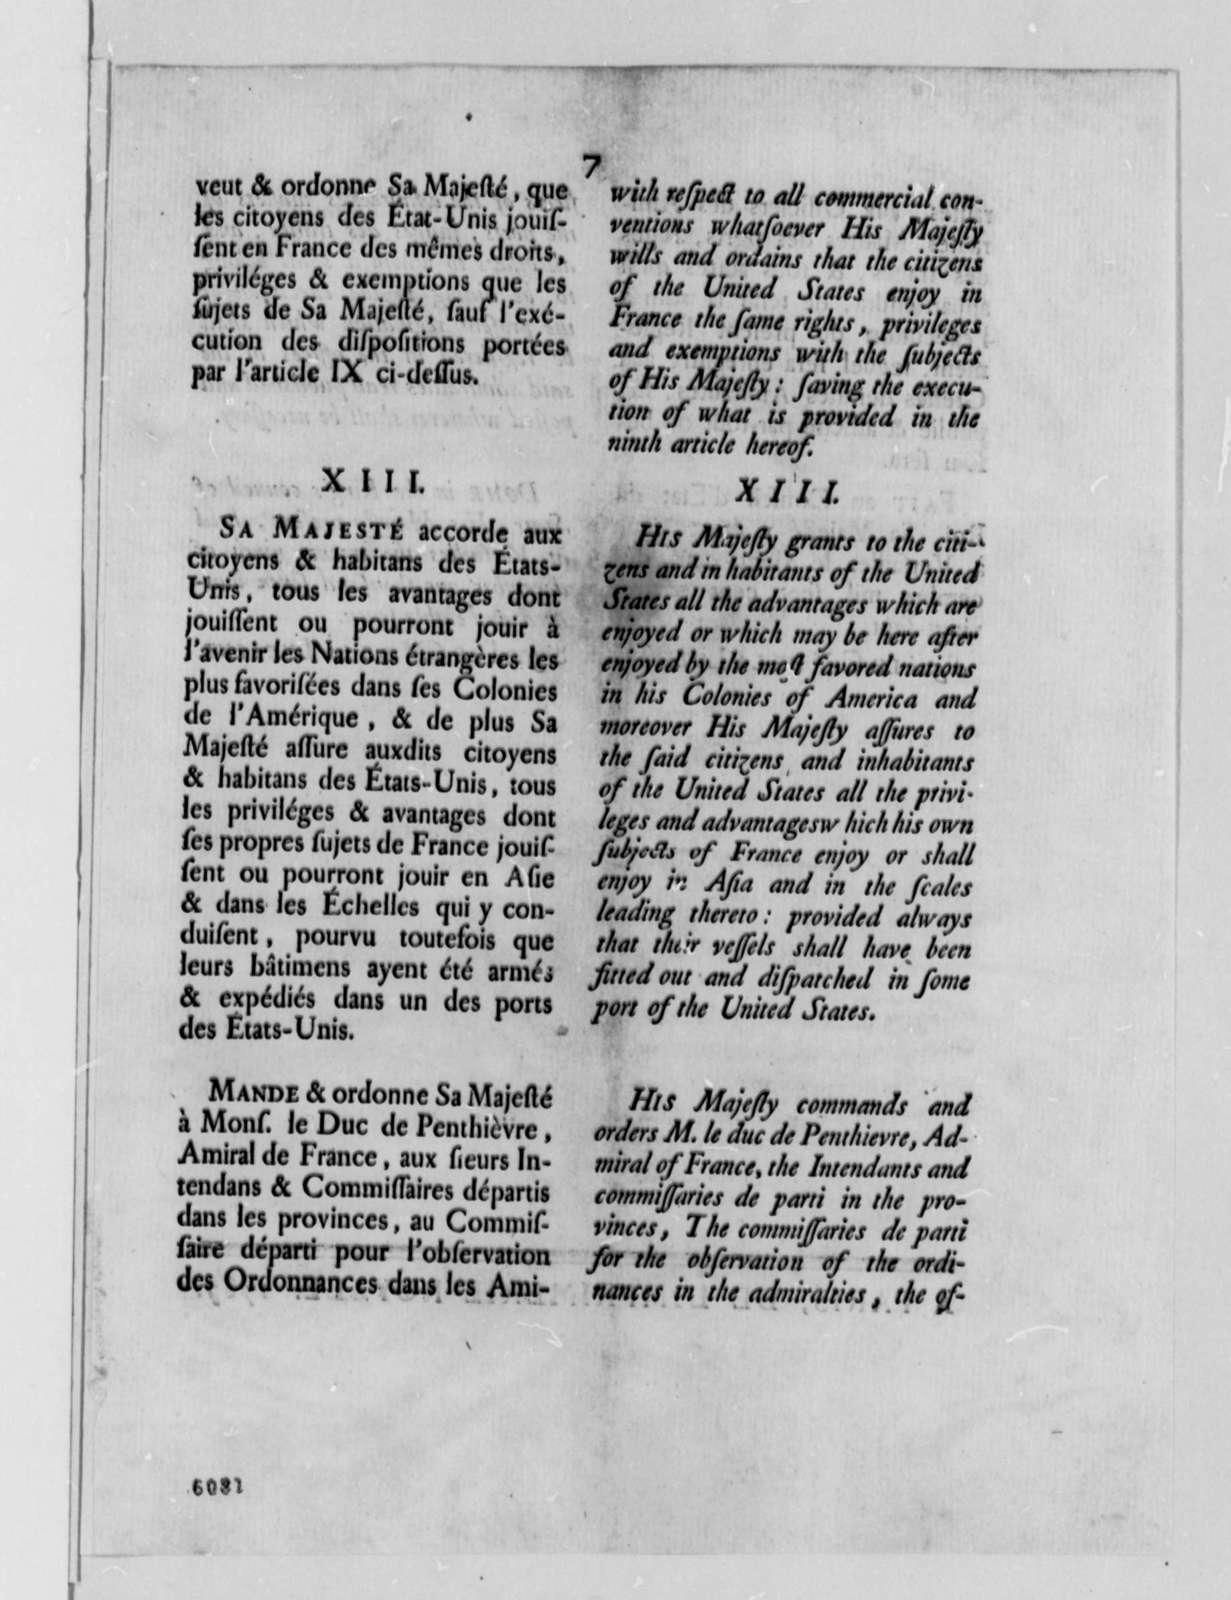 Charles G  Lambert to Thomas Jefferson, December 29, 1787